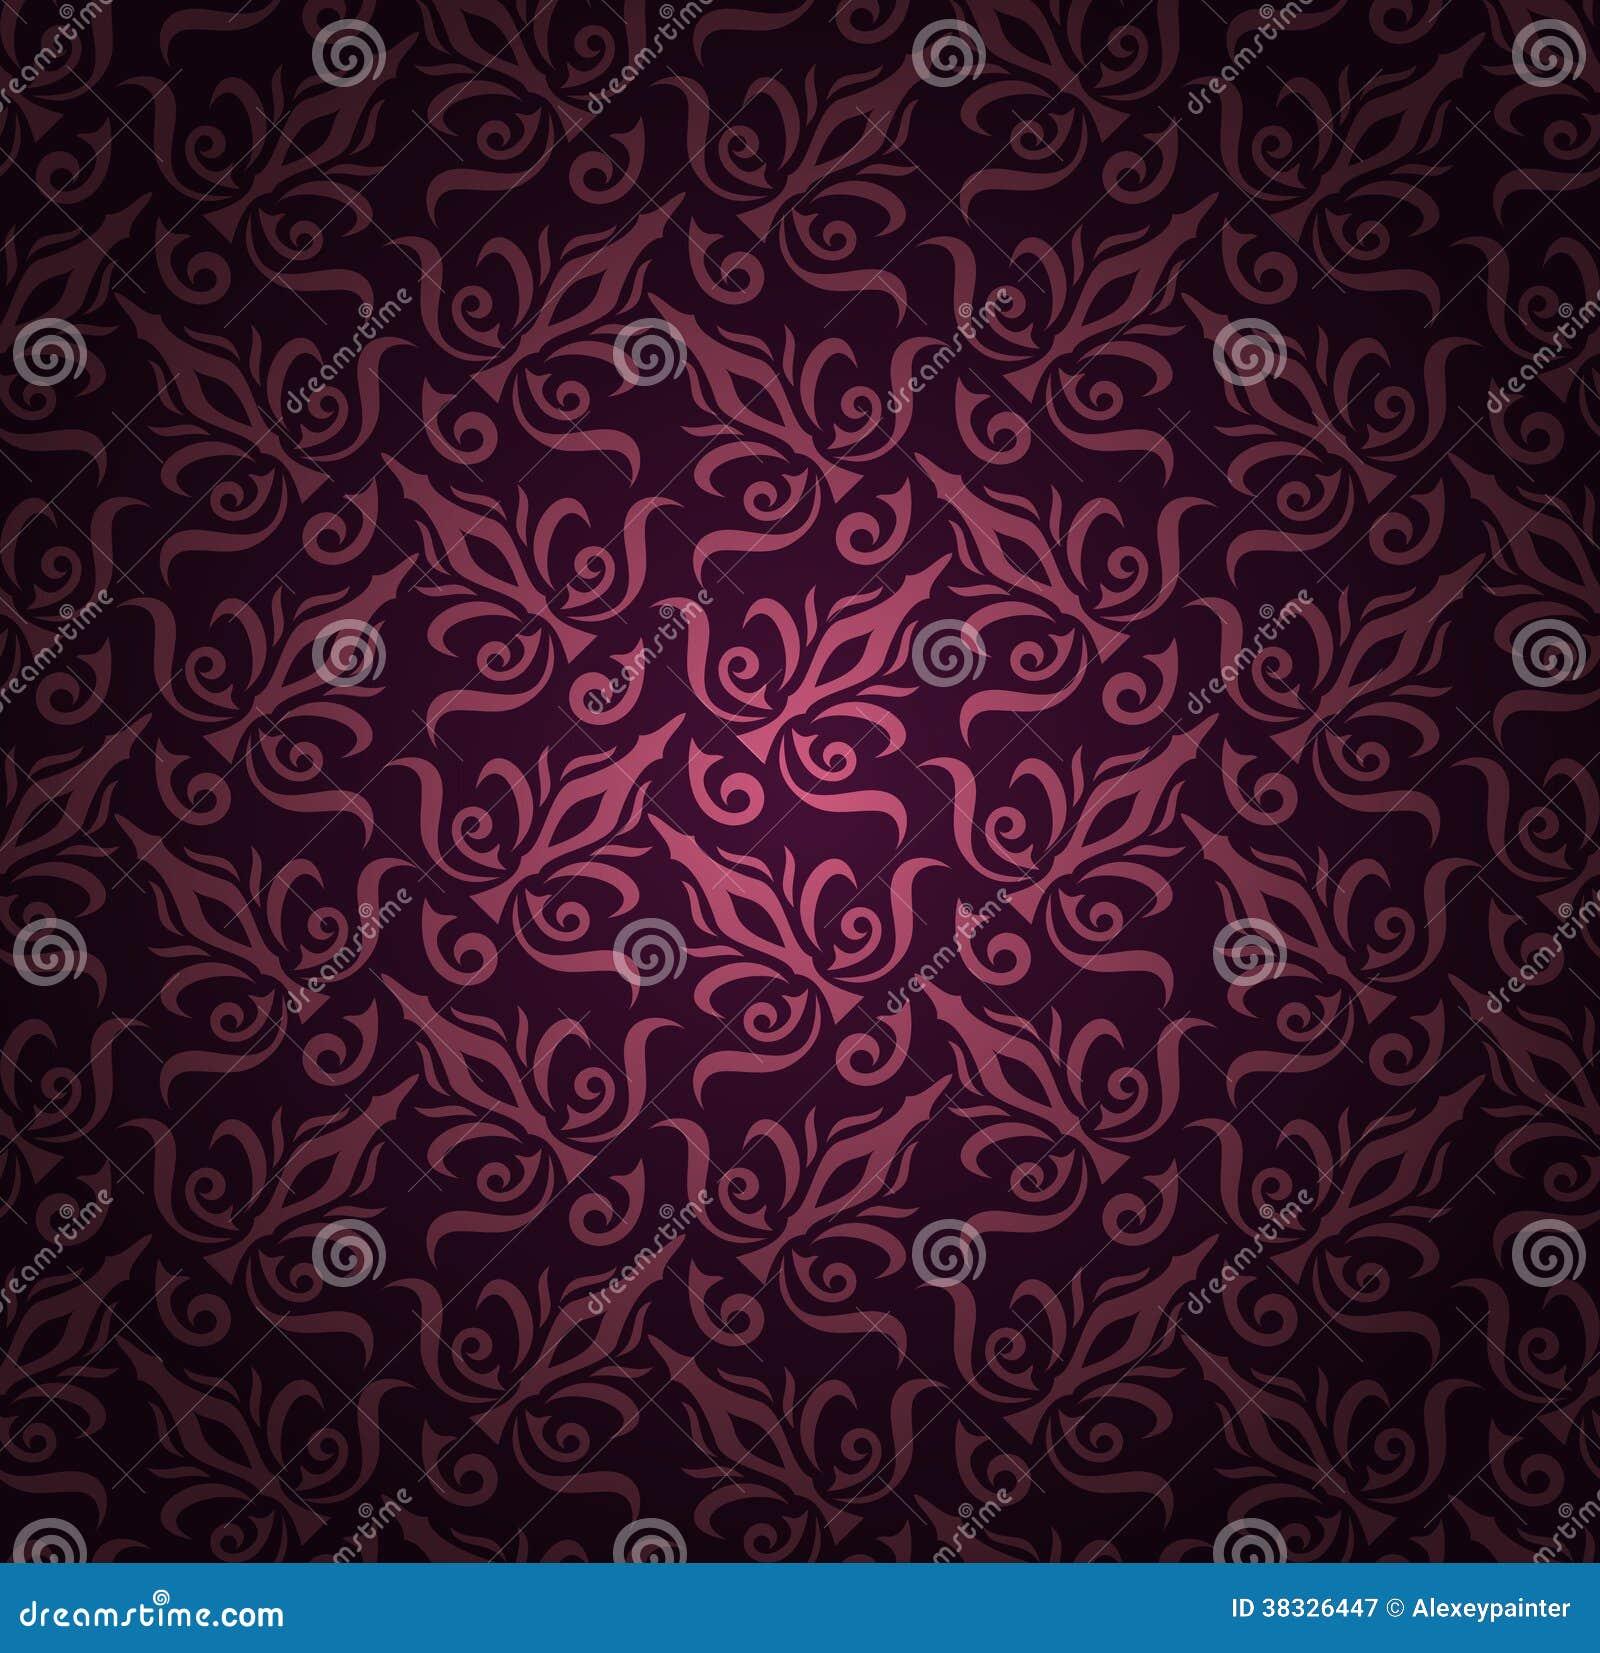 Seamless Floral Pattern Background. Damask Luxury Royal ...